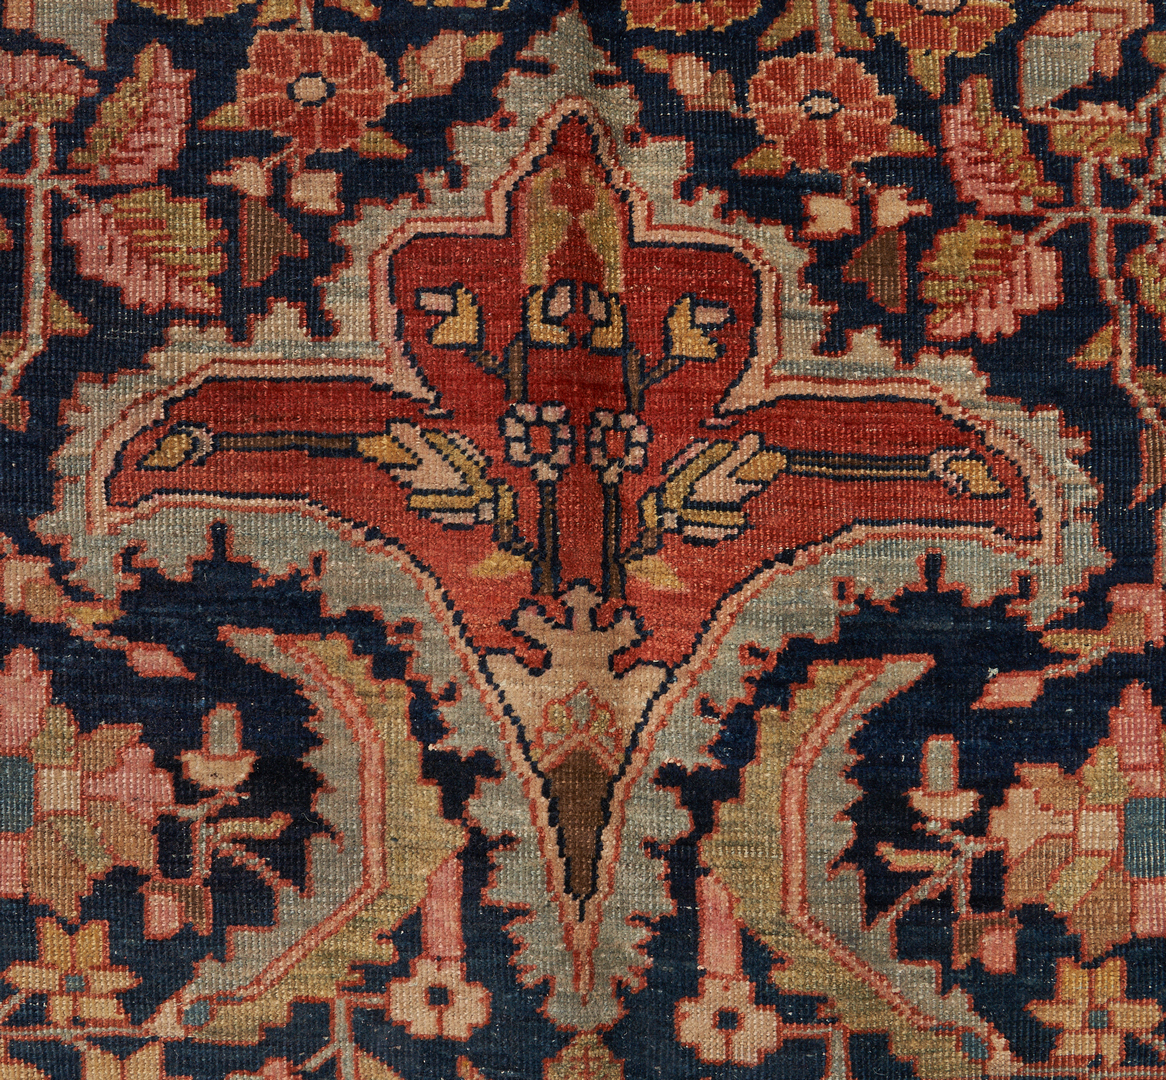 Lot 487: Antique Persian Sarouk Rug or Carpet, 13' x 10'